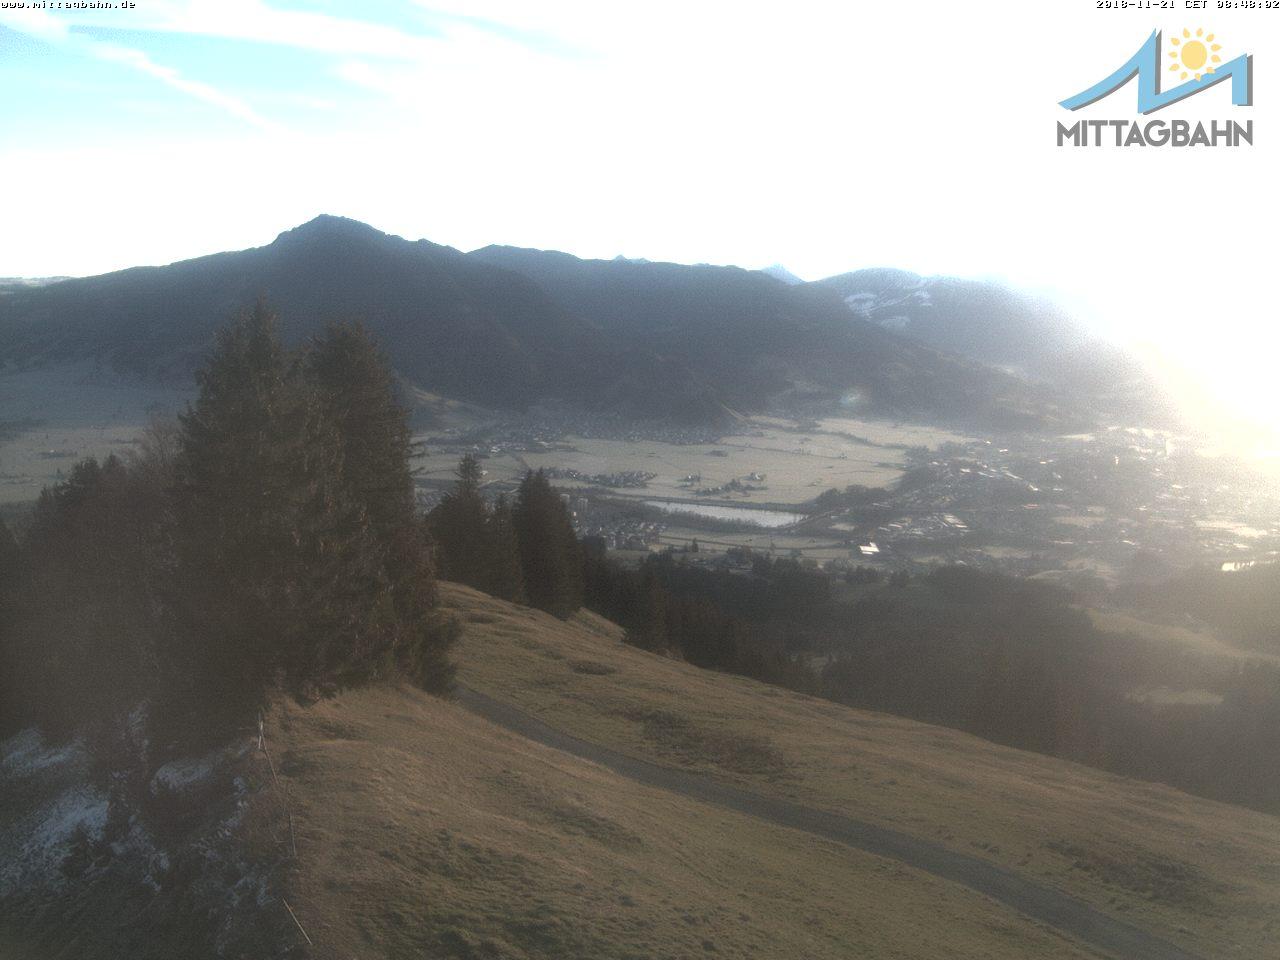 Webcam Ski Resort Immenstadt - Mittag cam 6 - Bavaria Alps - Allg�u